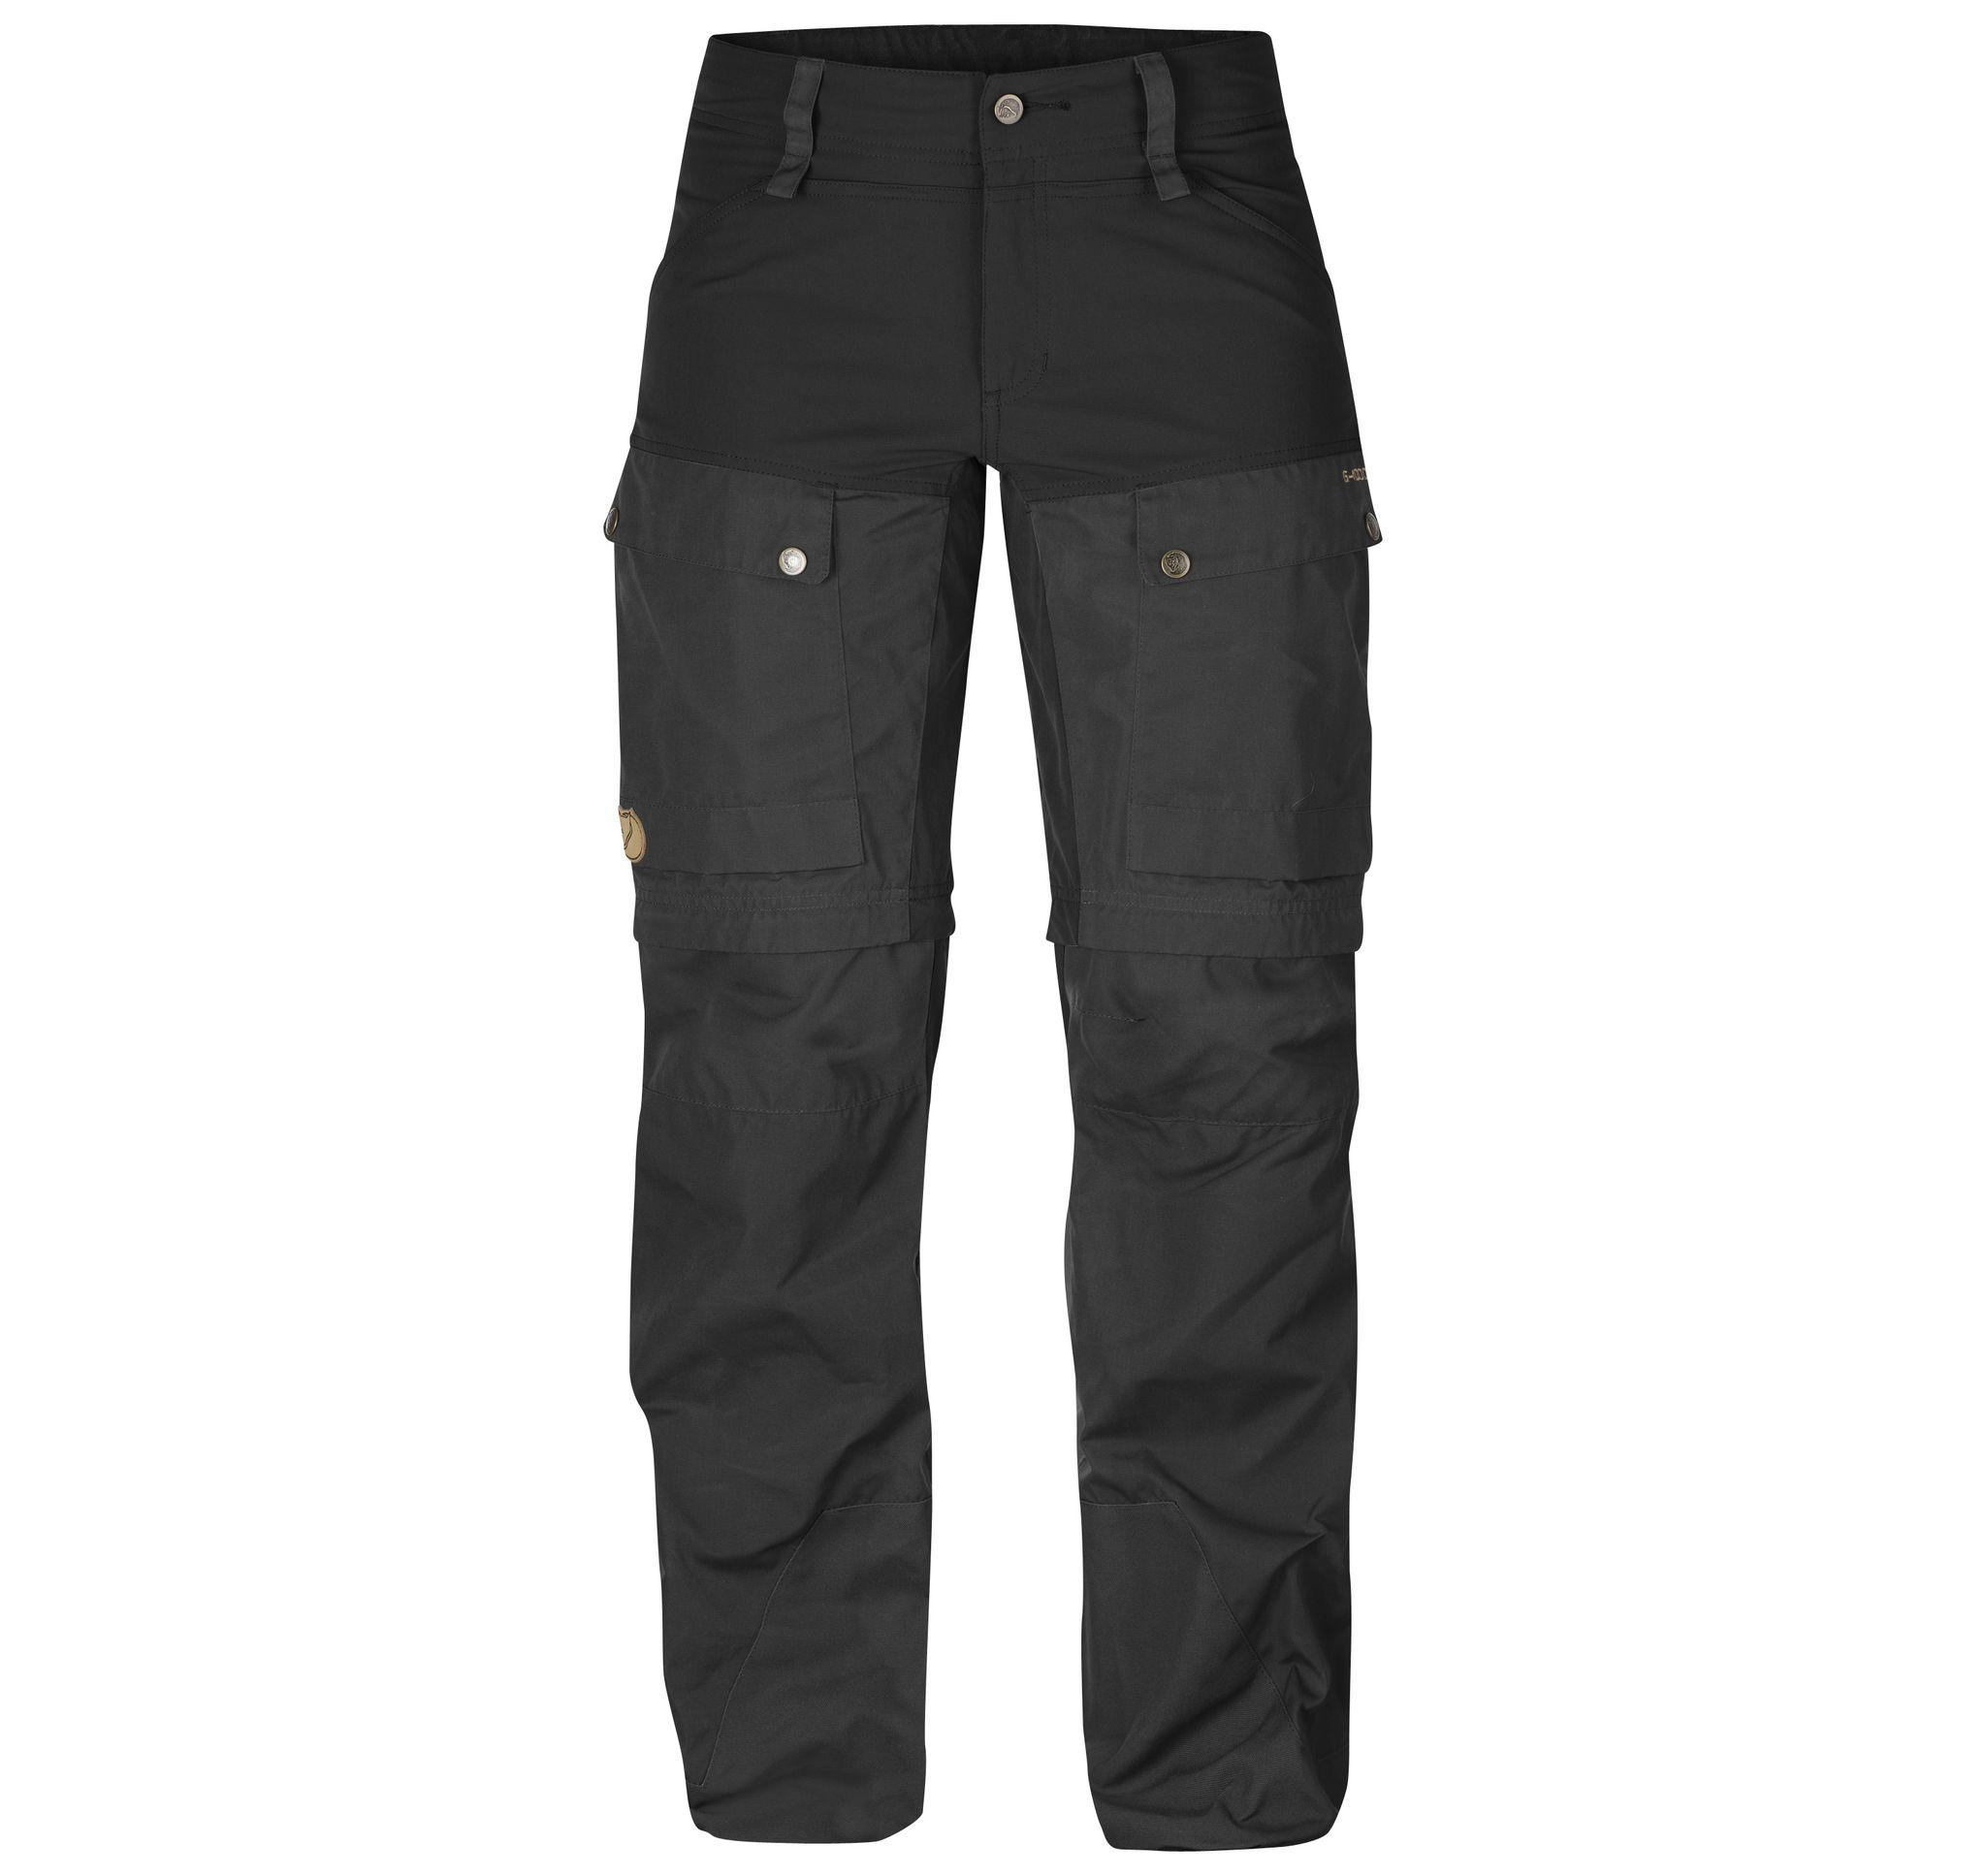 Keb Gaiter Trousers W., Black, 34